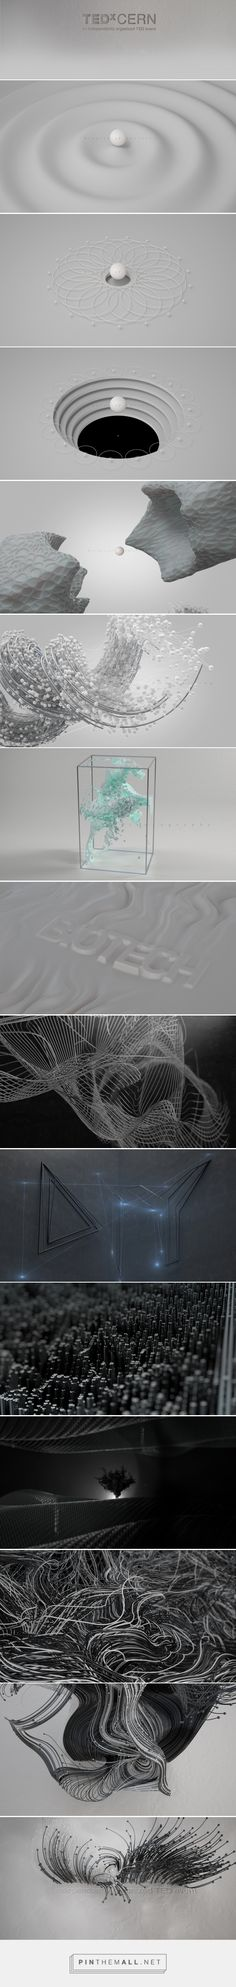 TEDxCERN _ Main Titles on Behance - created via https://pinthemall.net